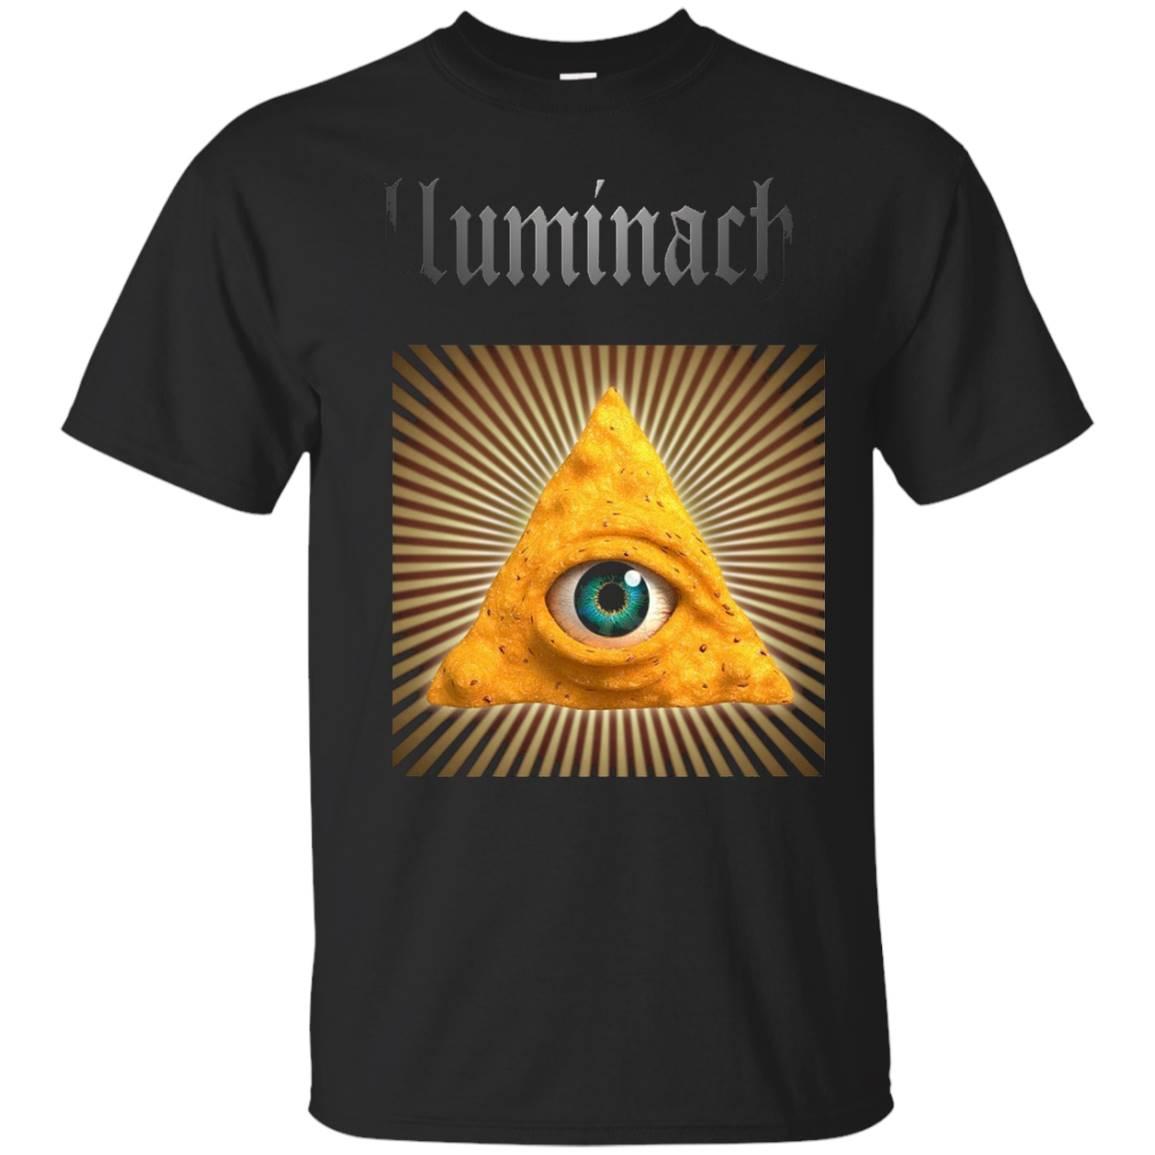 Illuminachos Illuminati Parody Shirt